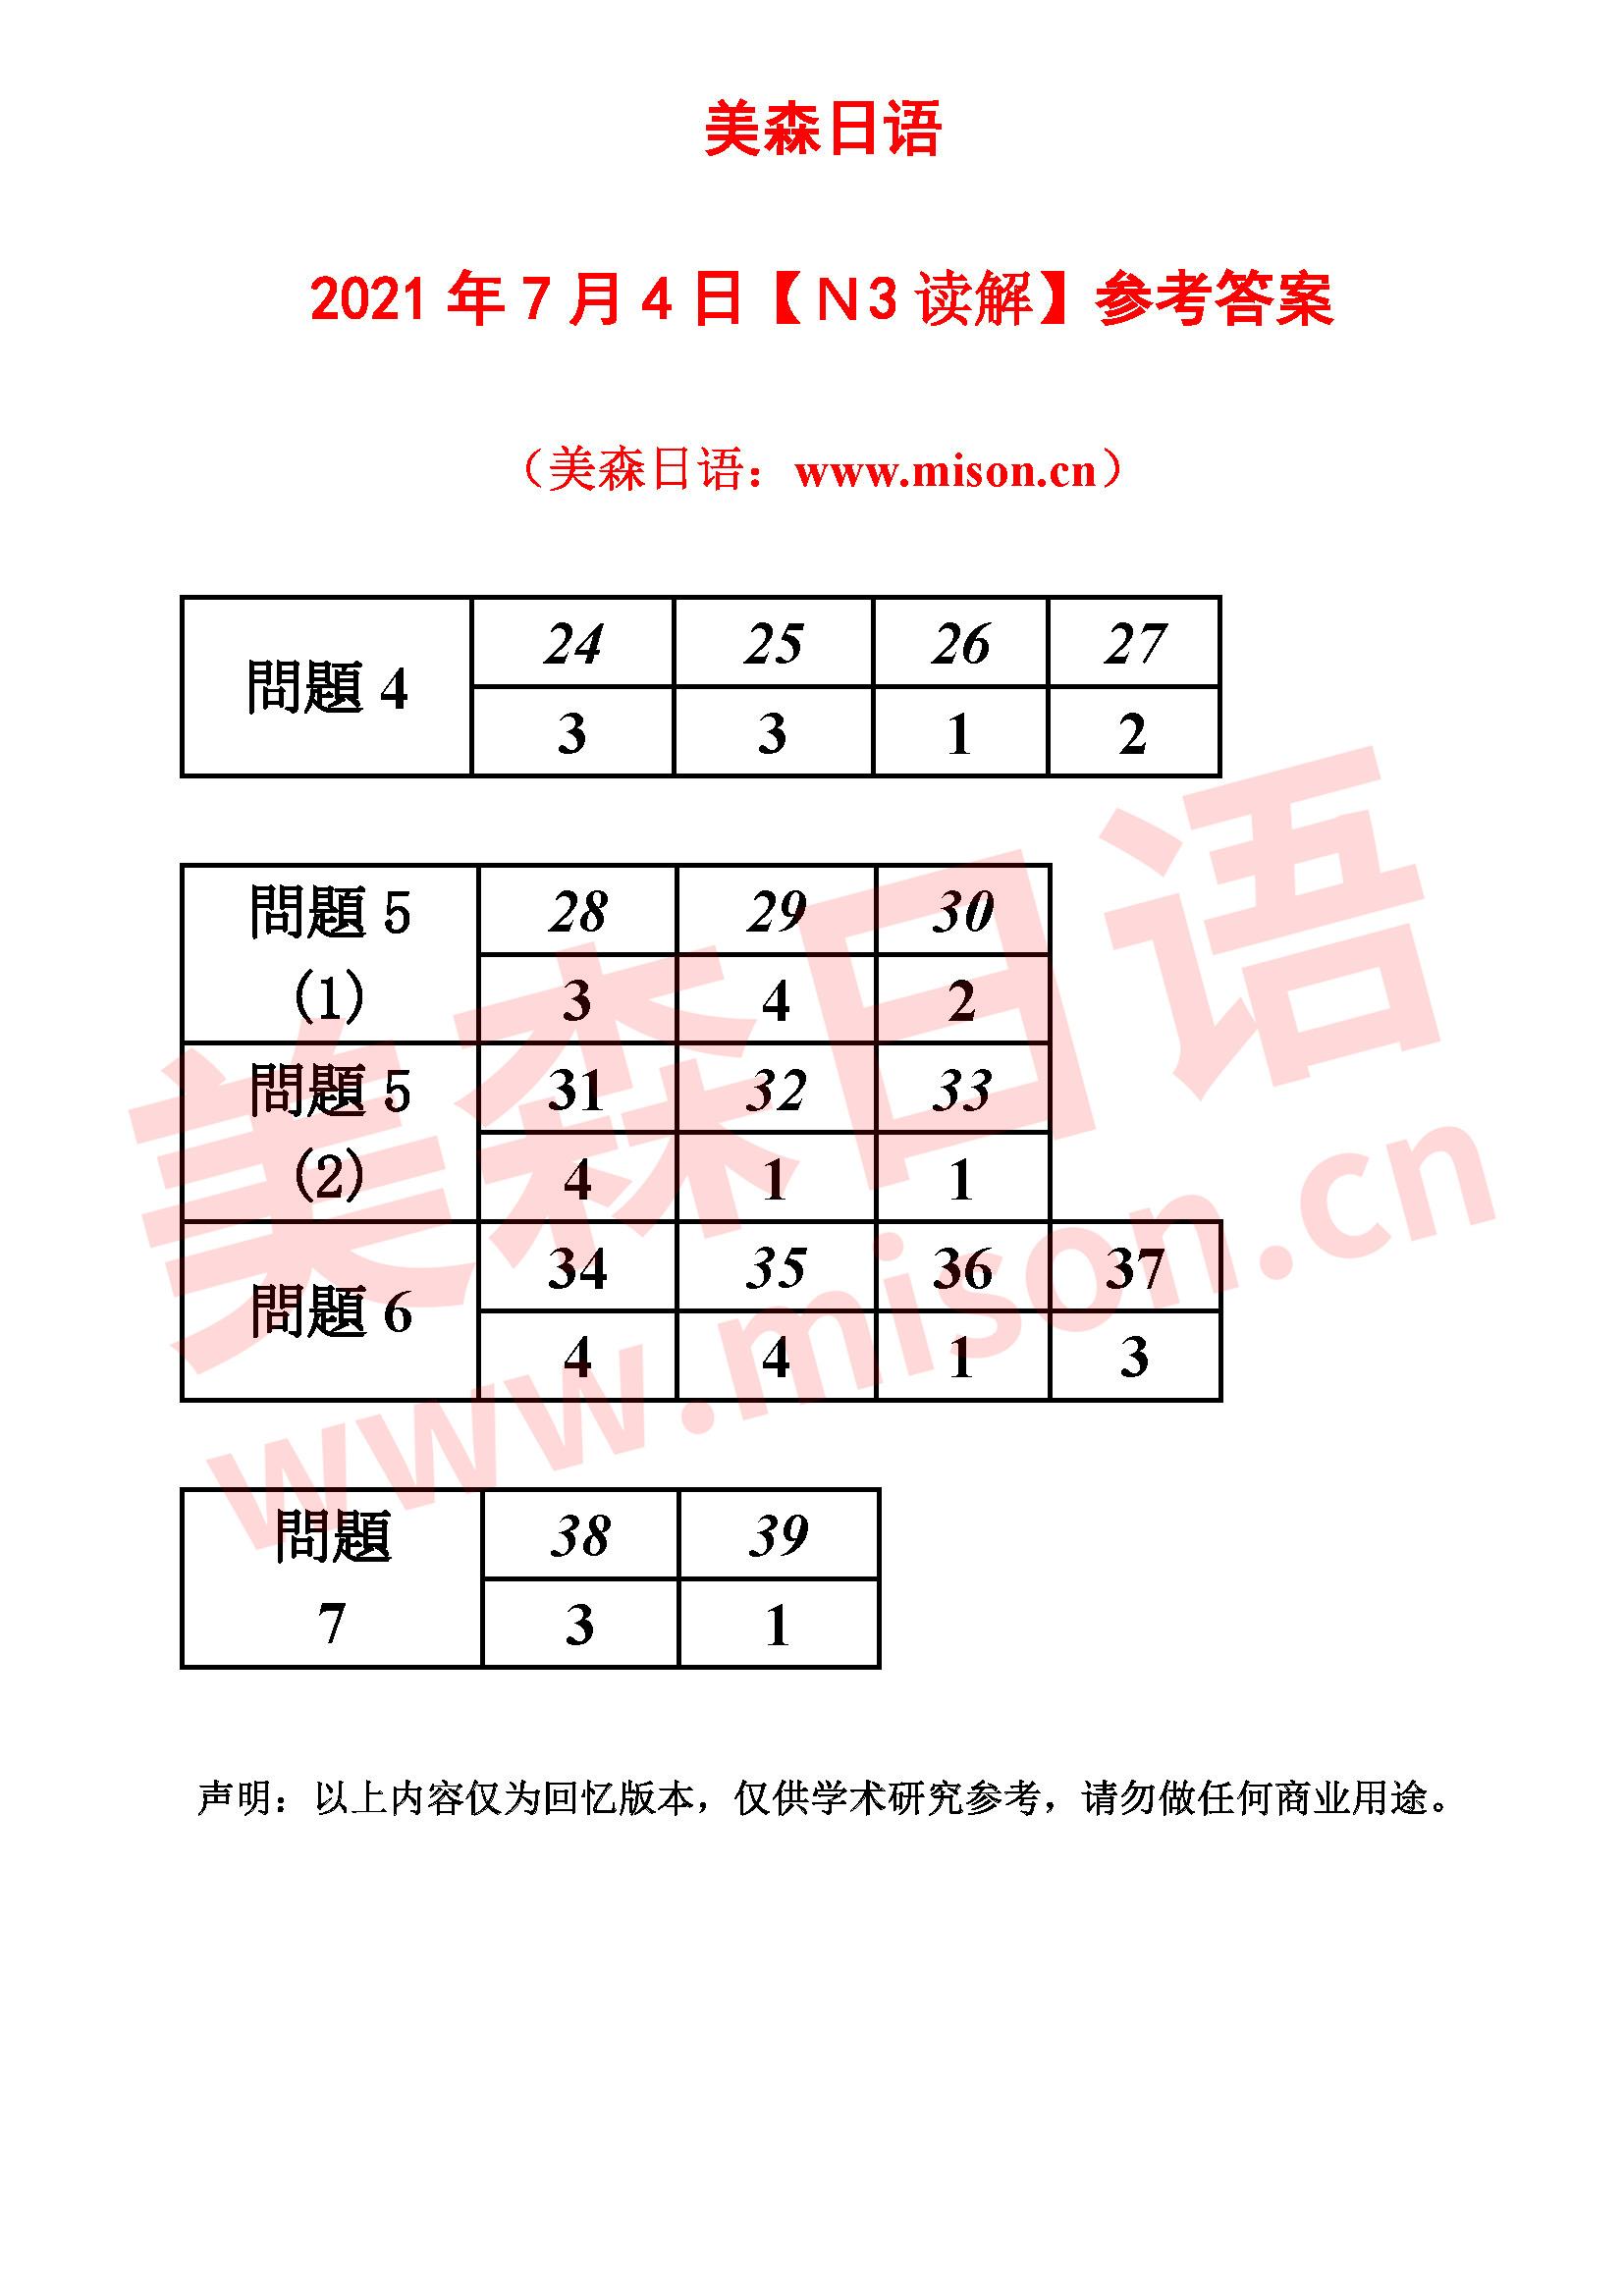 N3读解答案.jpg